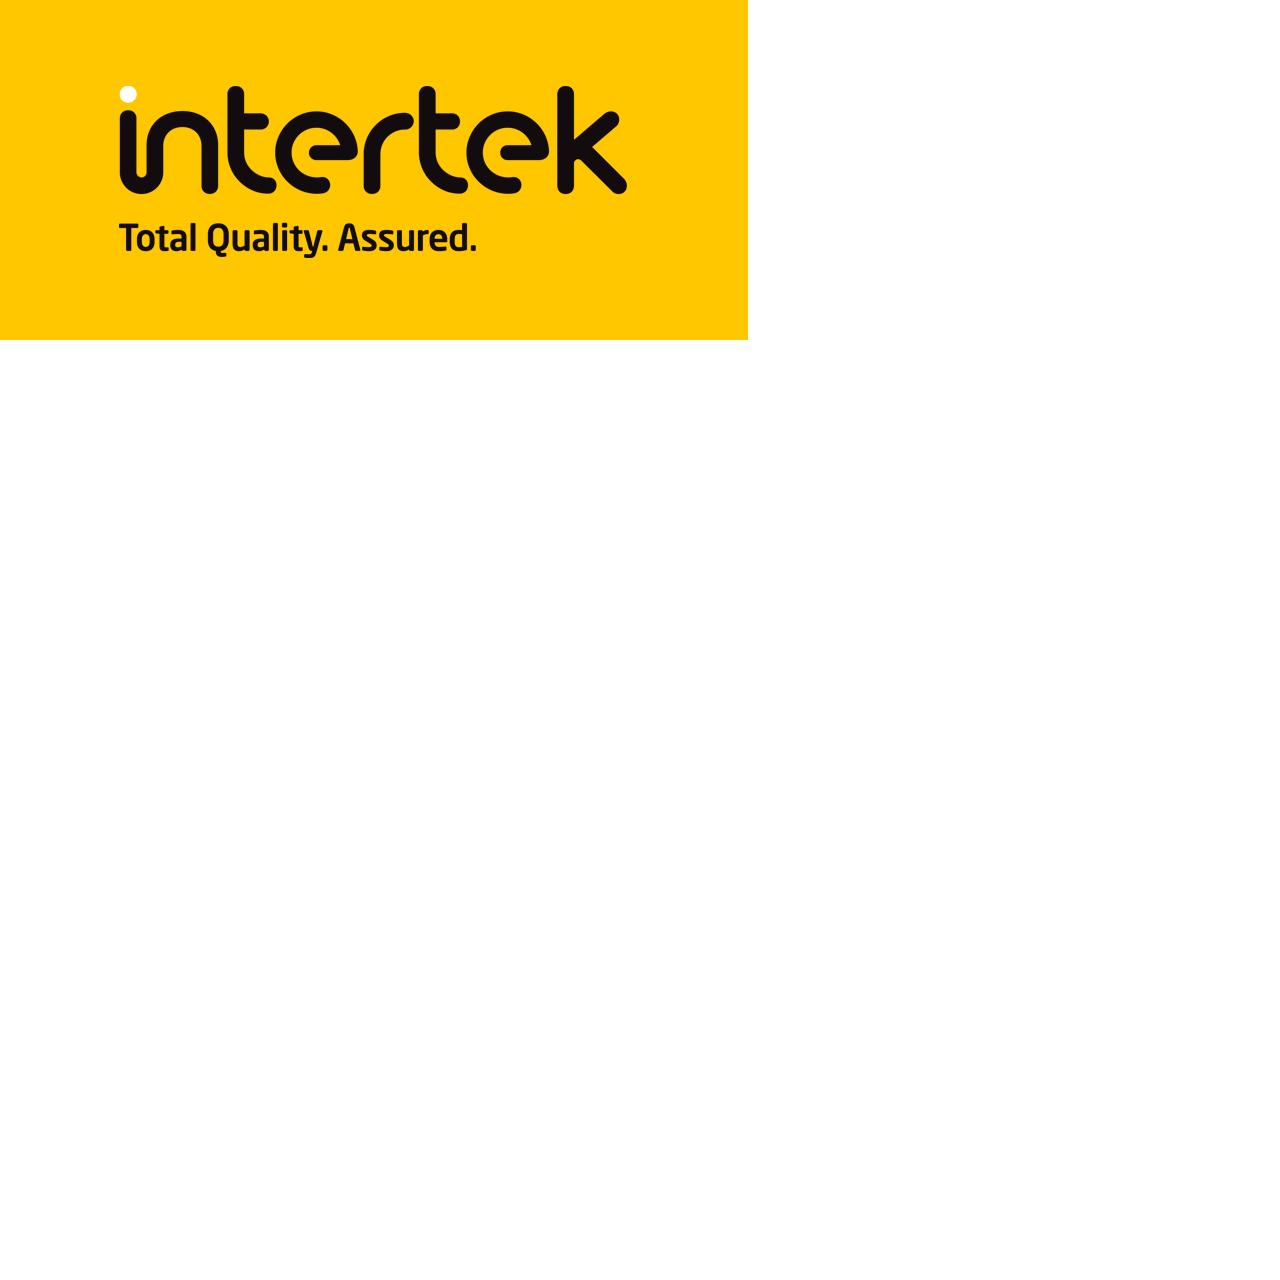 RMW intertek total quality assured